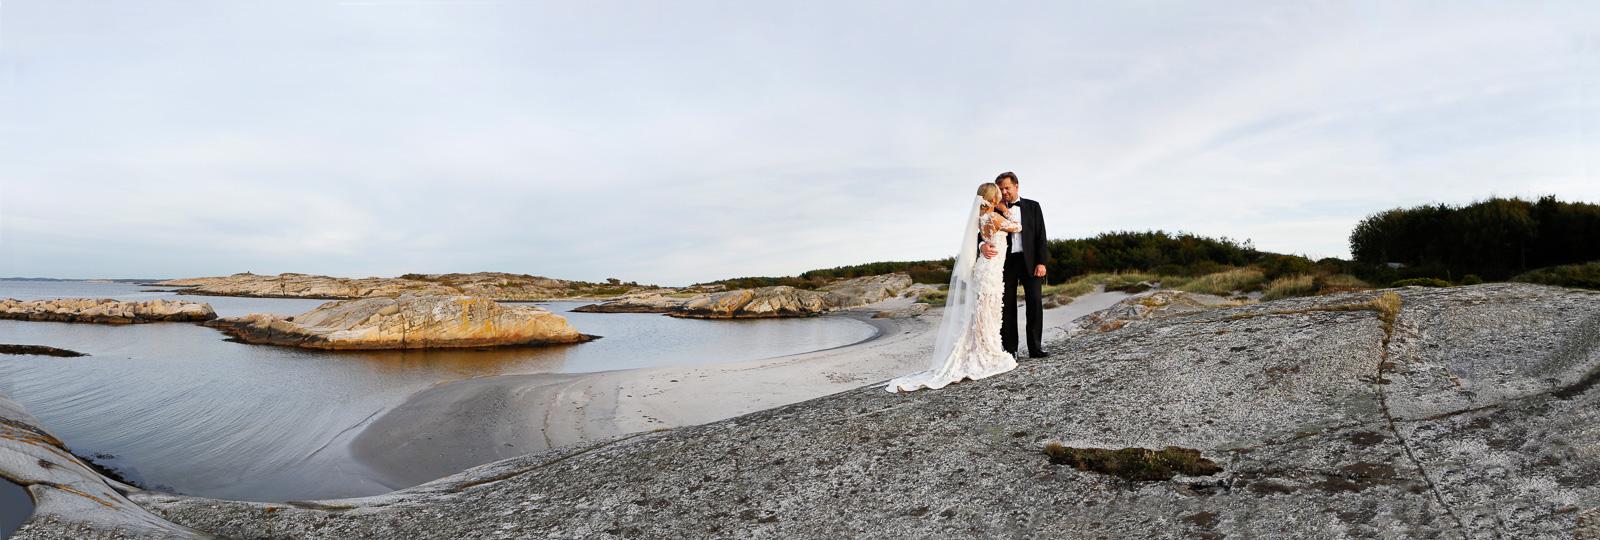 68 a Støtvig hotel bryllup